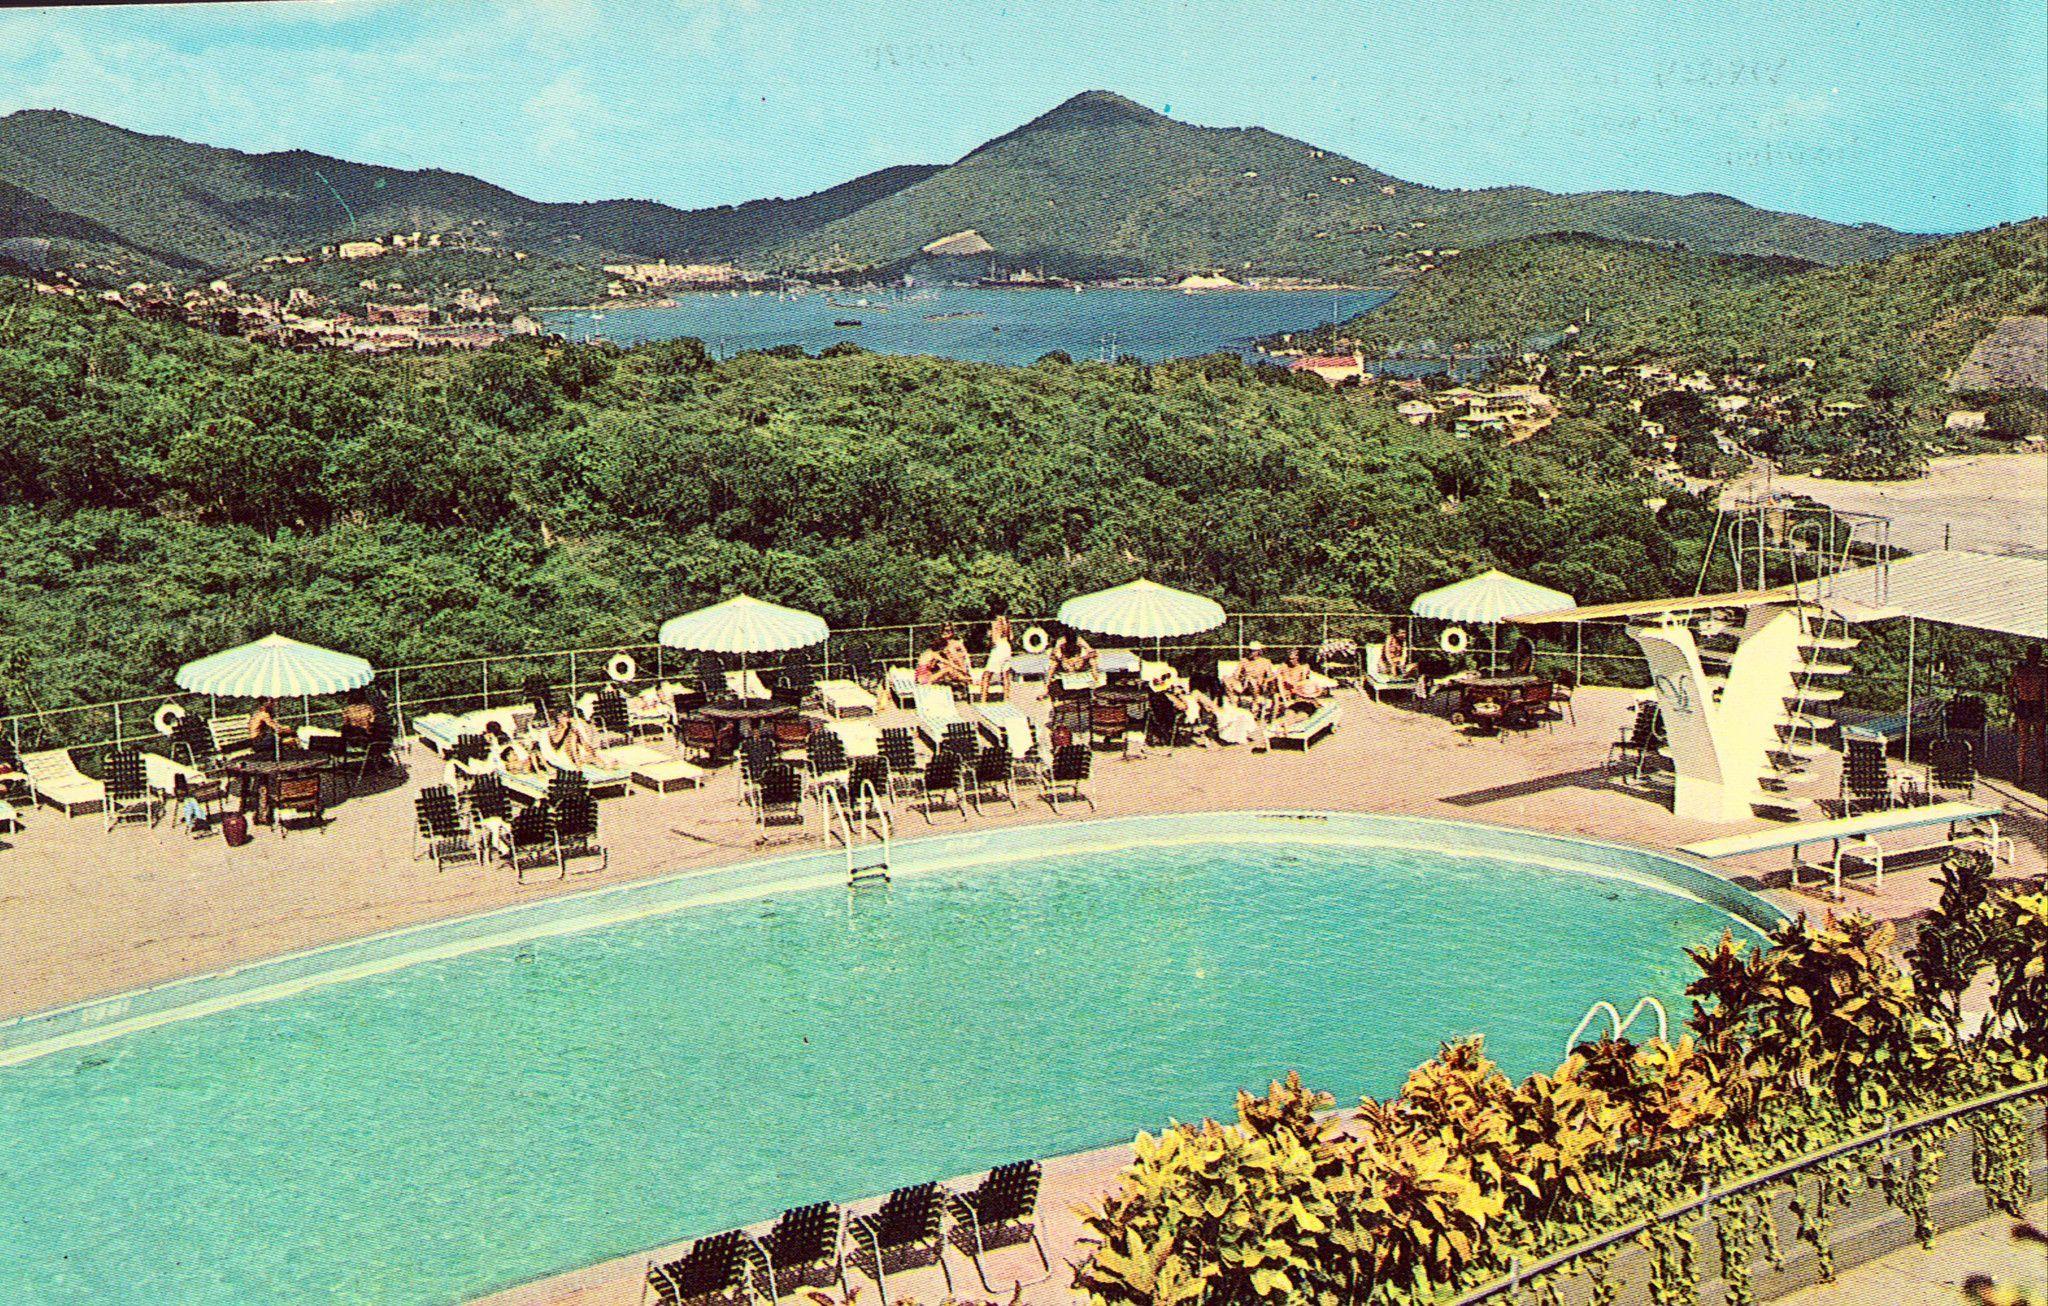 Vintage Hotel Postcards Unused Postcard Swimming Pool At Virgin Isle Hilton St Thomas Islands Plastichrome By Colourpicture P55170